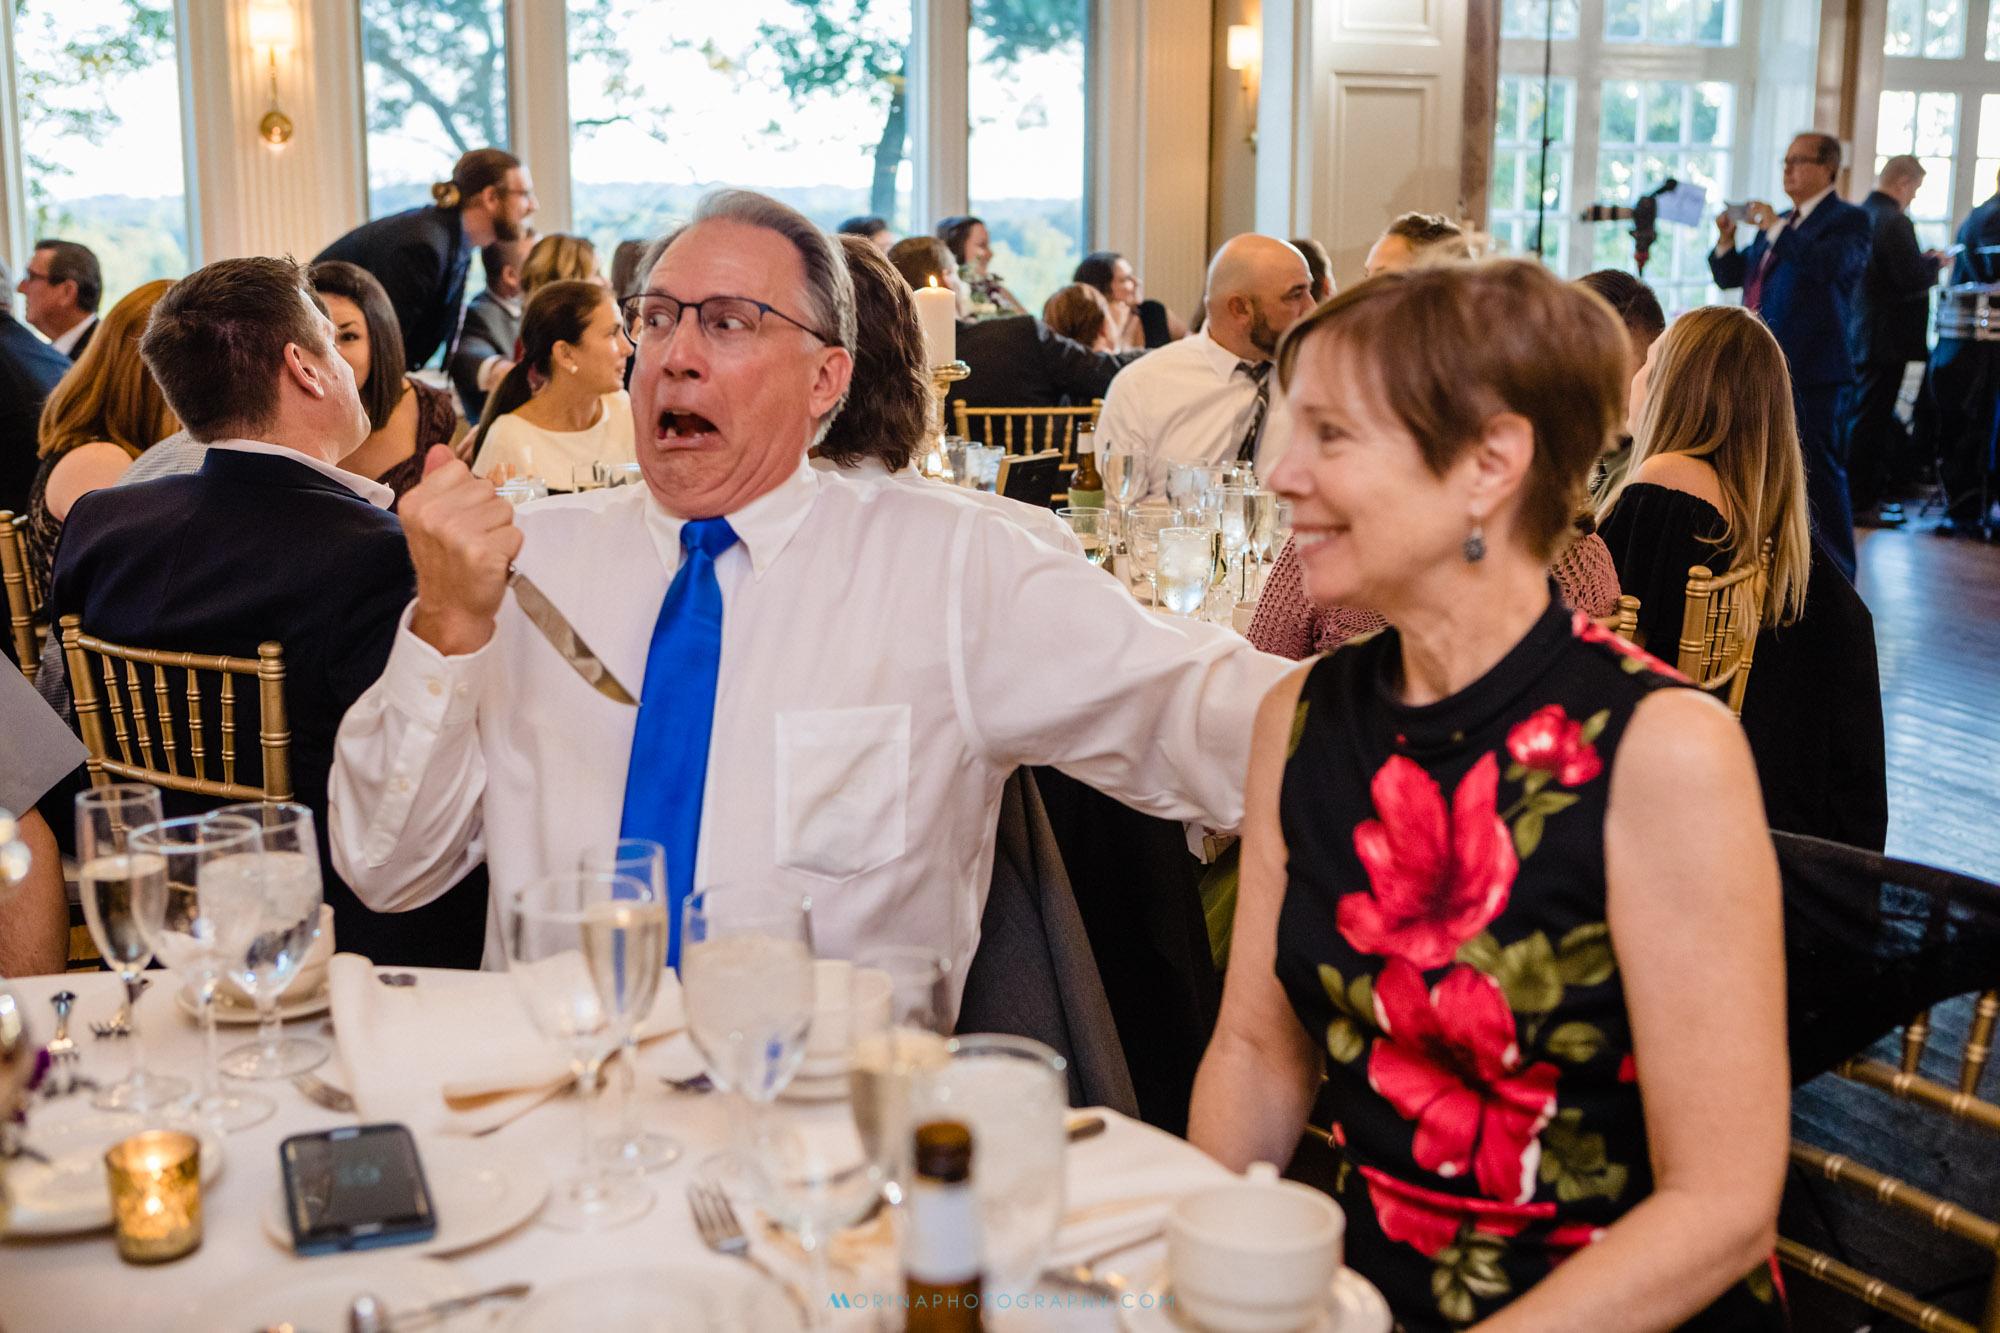 Colleen & Bill Wedding at Manufacturers' Golf & Country Club wedding 0069.jpg